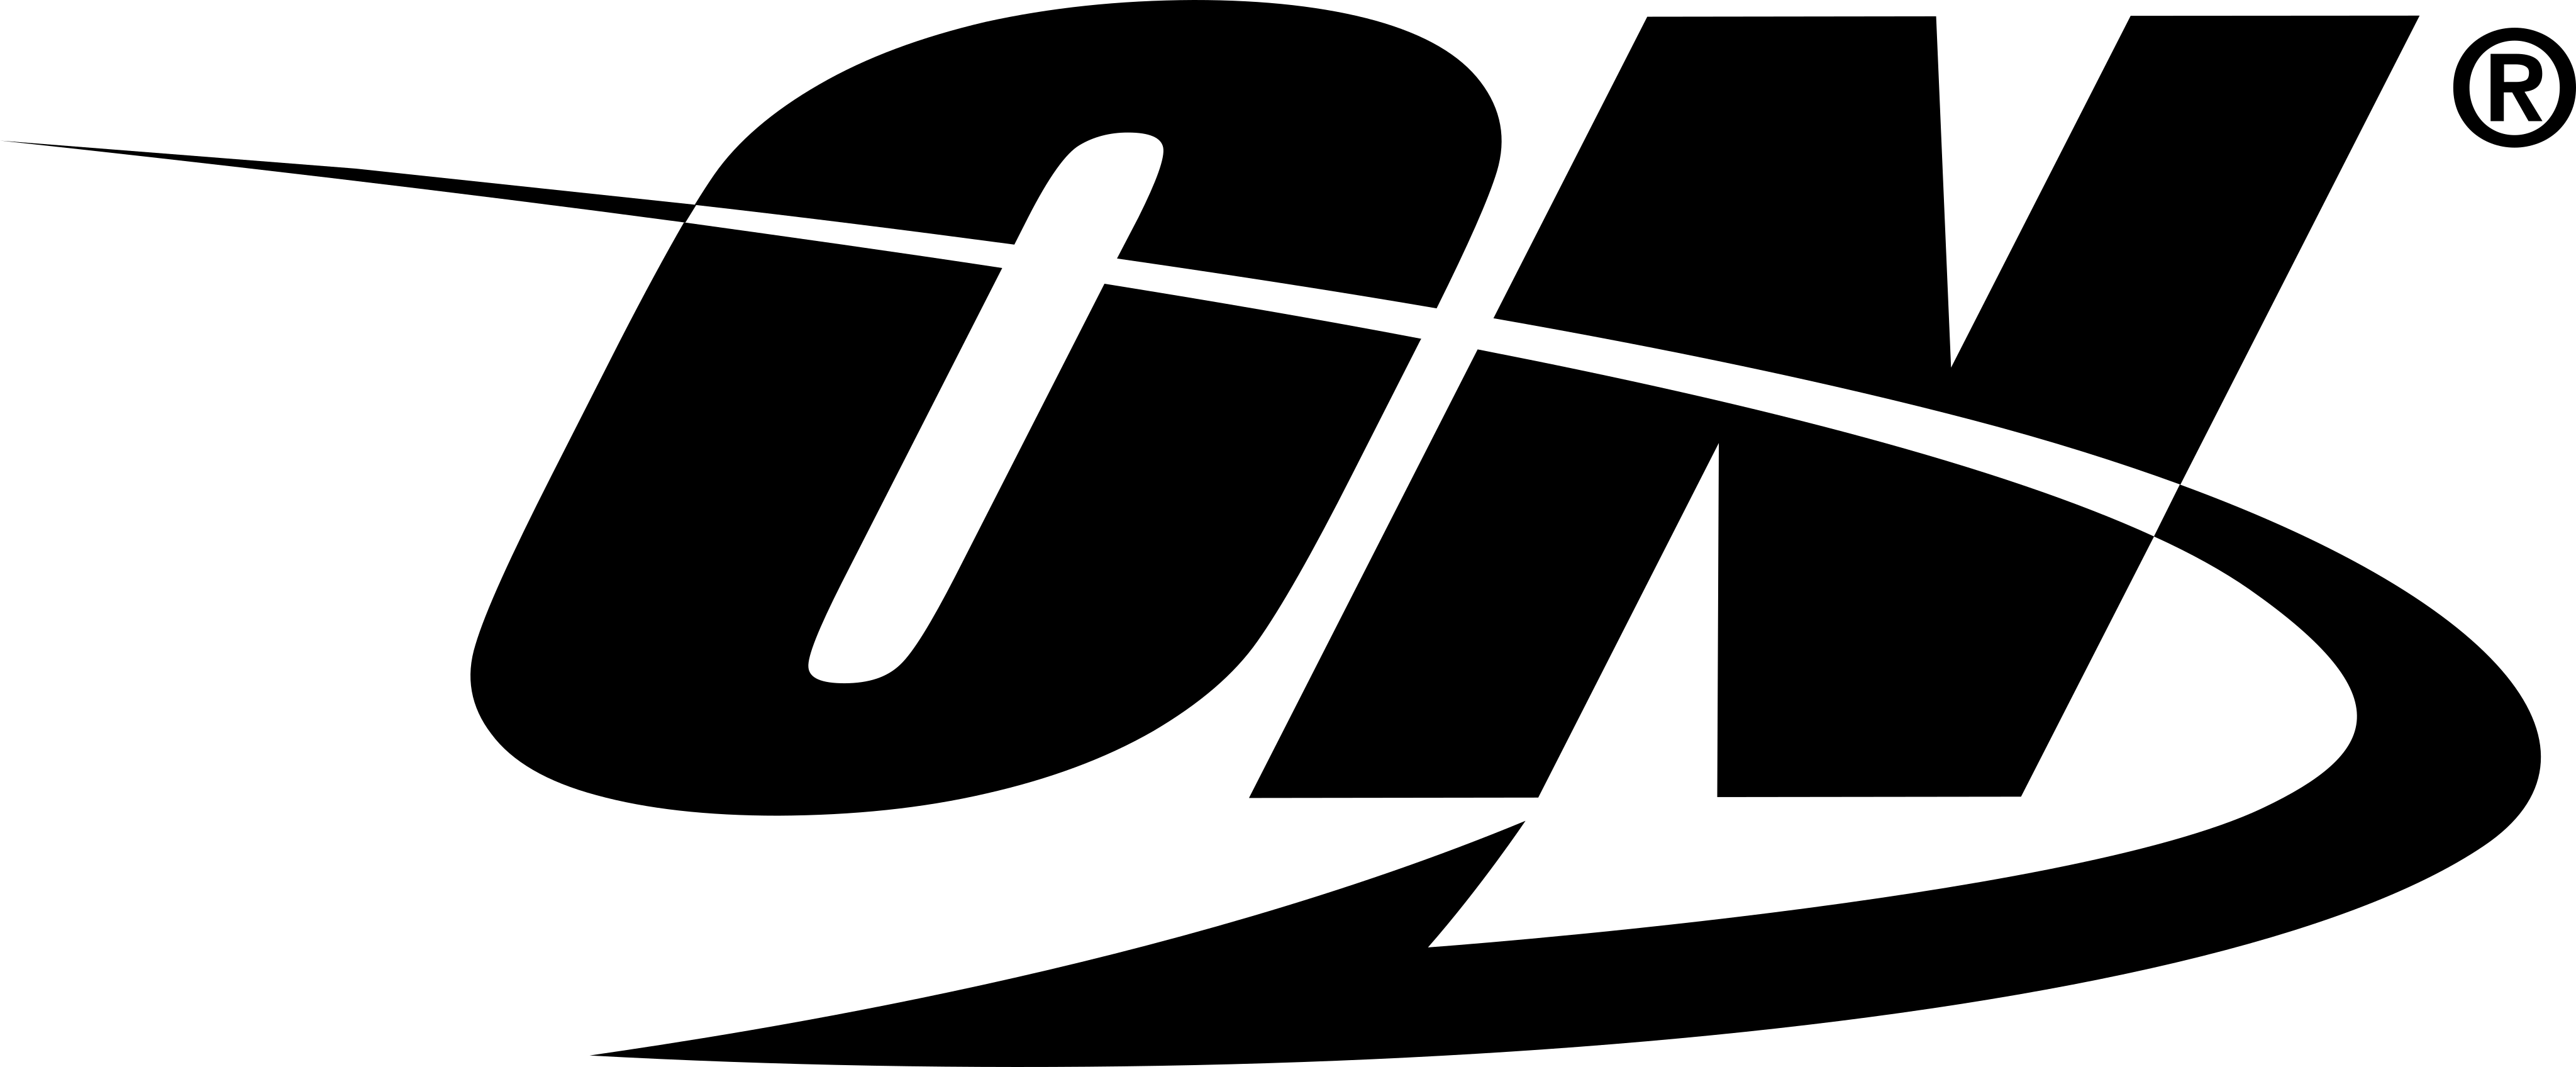 optimum nutrition logo 1 - Optimum Nutrition Logo